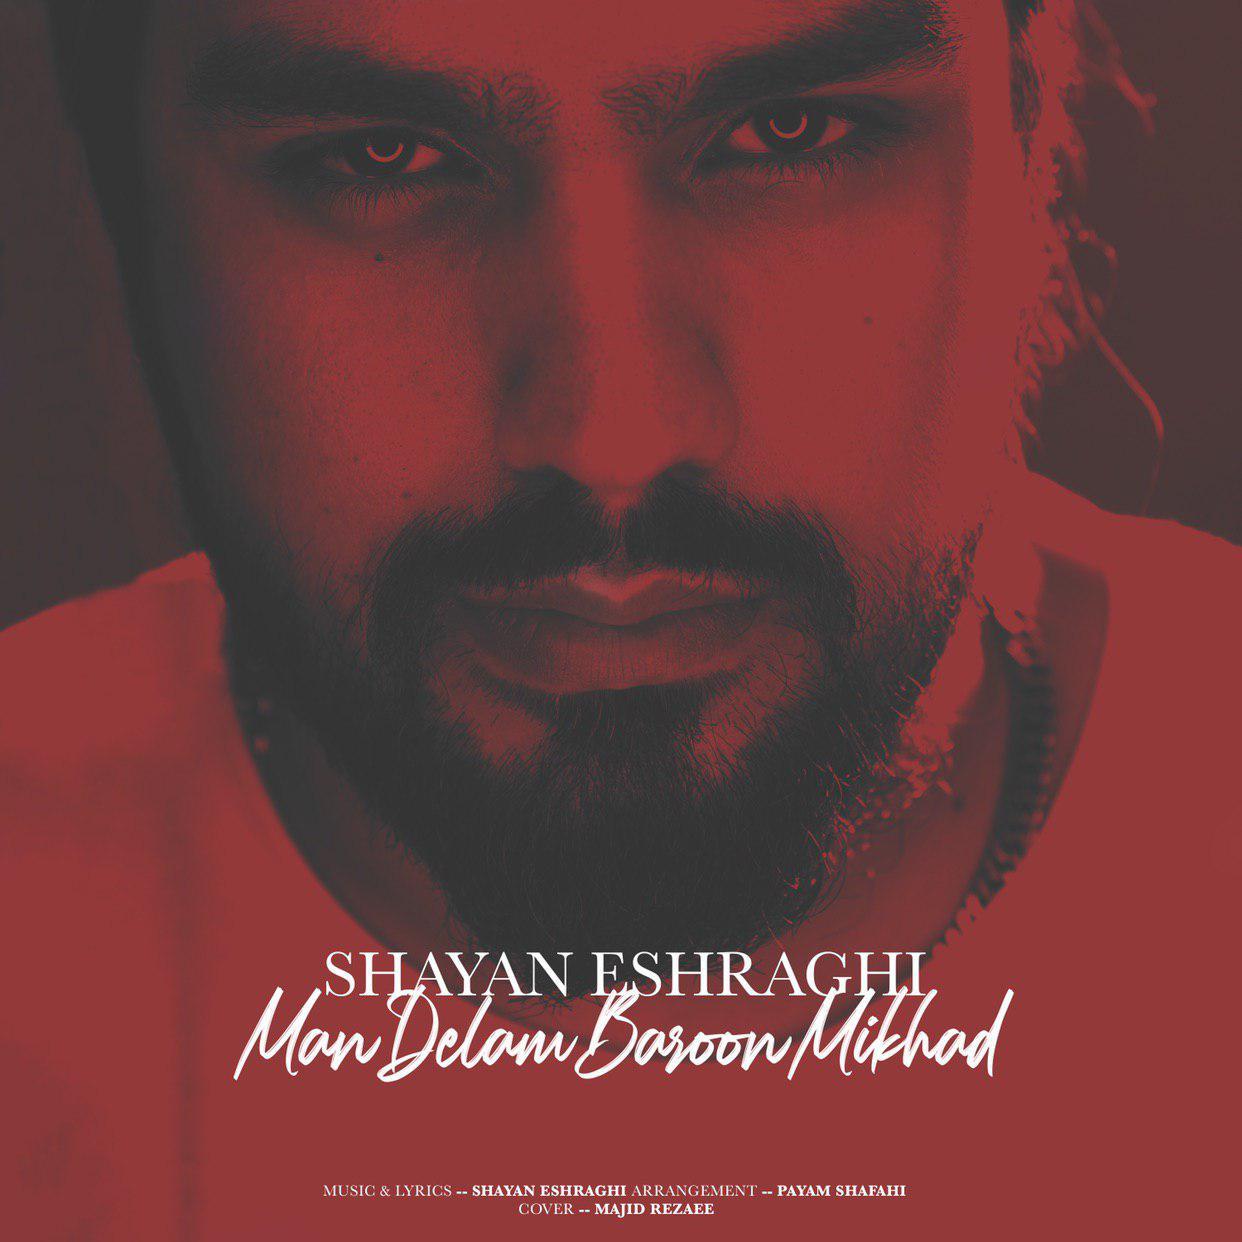 Shayan Eshraghi – Man Delam Baron Mikhad